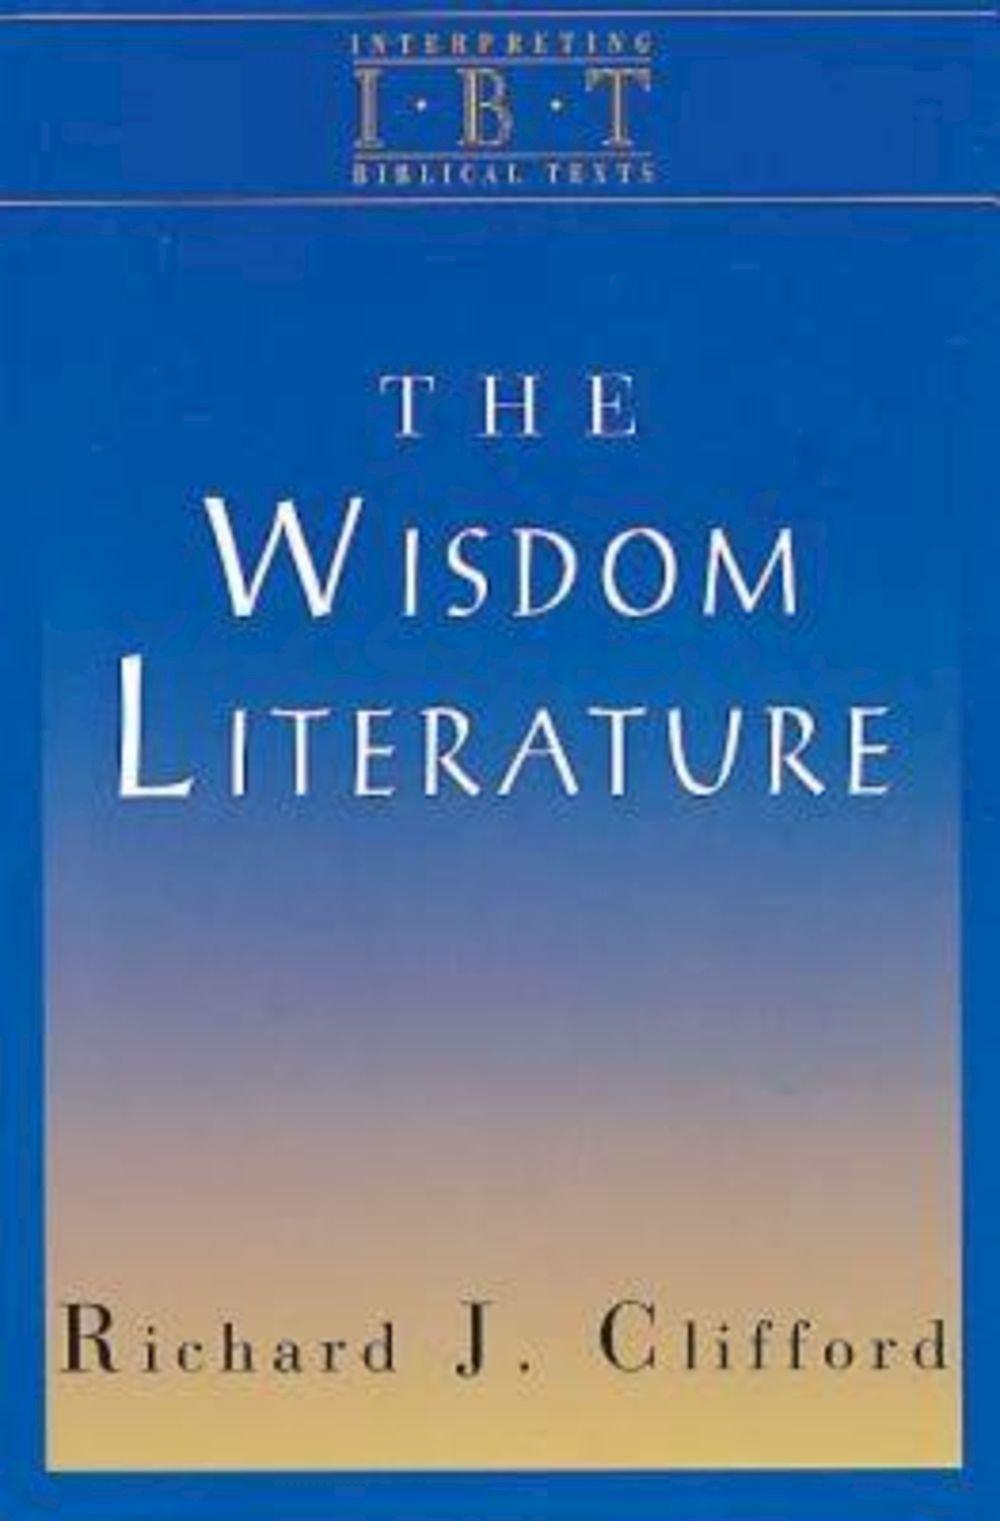 Literature craft and voice 2nd edition - The Wisdom Literature Interpreting Biblical Texts Series Richard J Clifford 9780687008469 Amazon Com Books